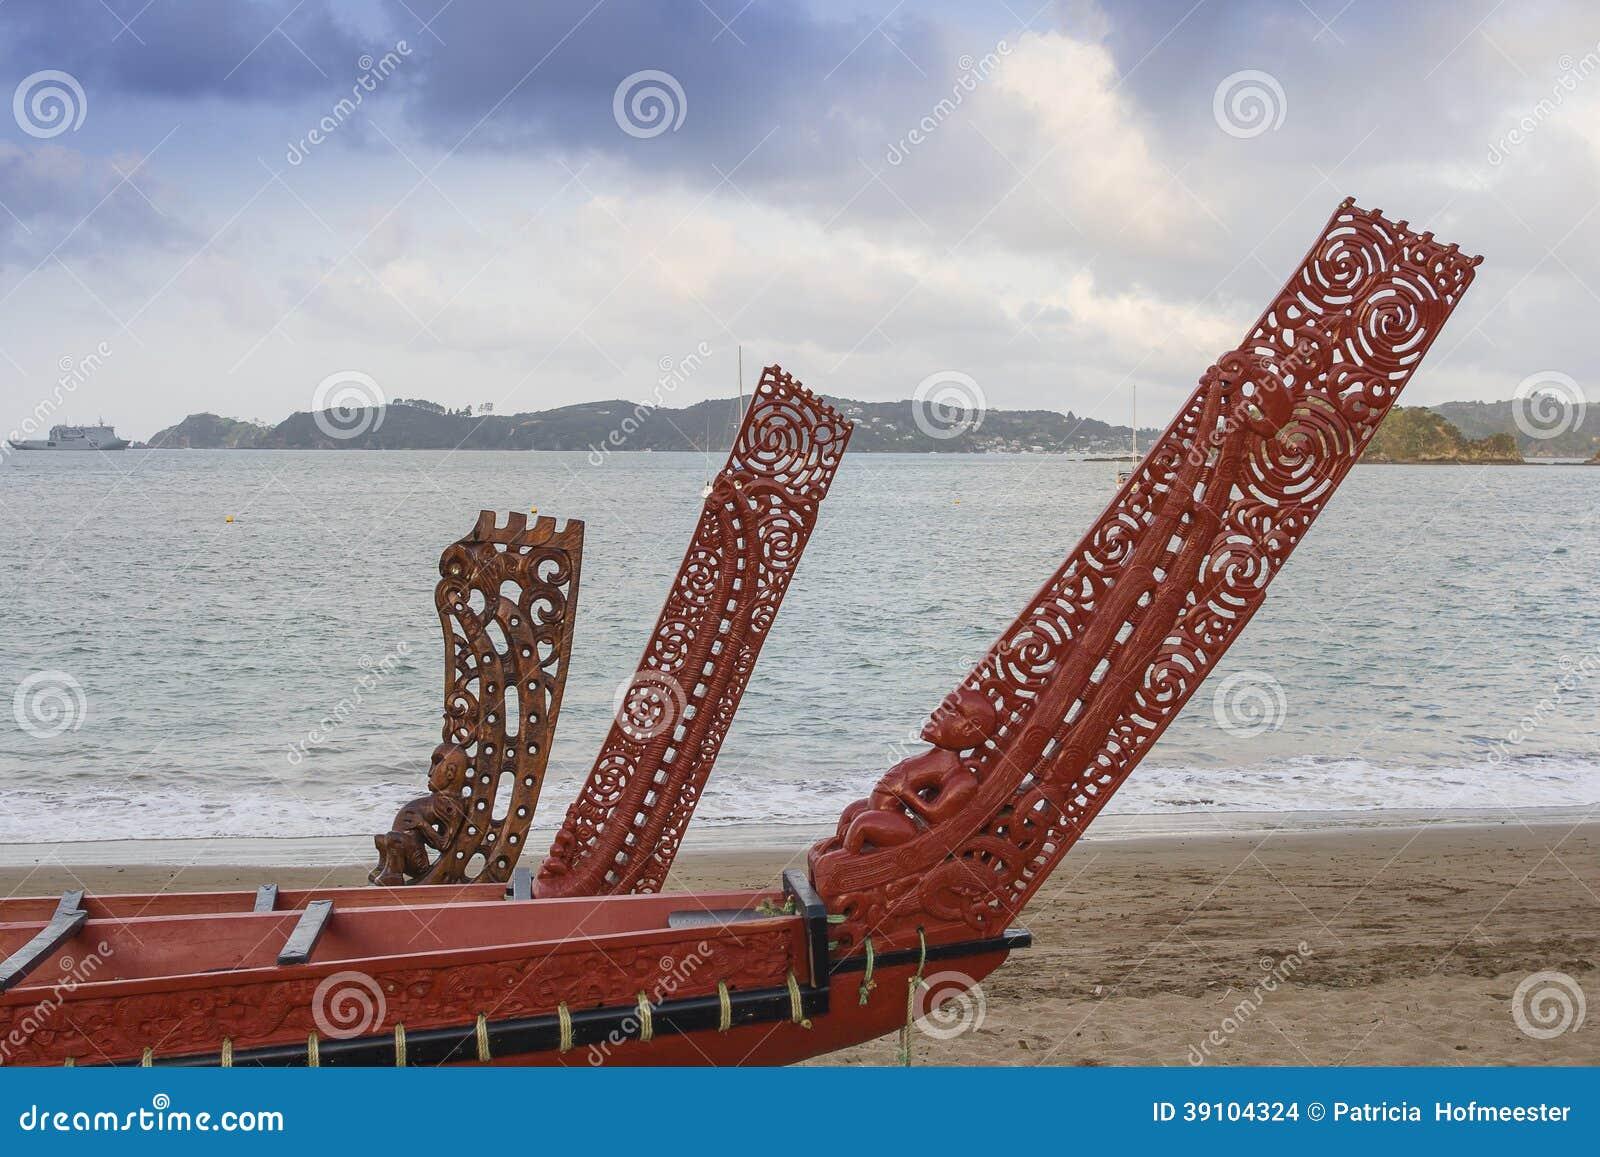 Drie prachtig houten gesneden Maoriboten